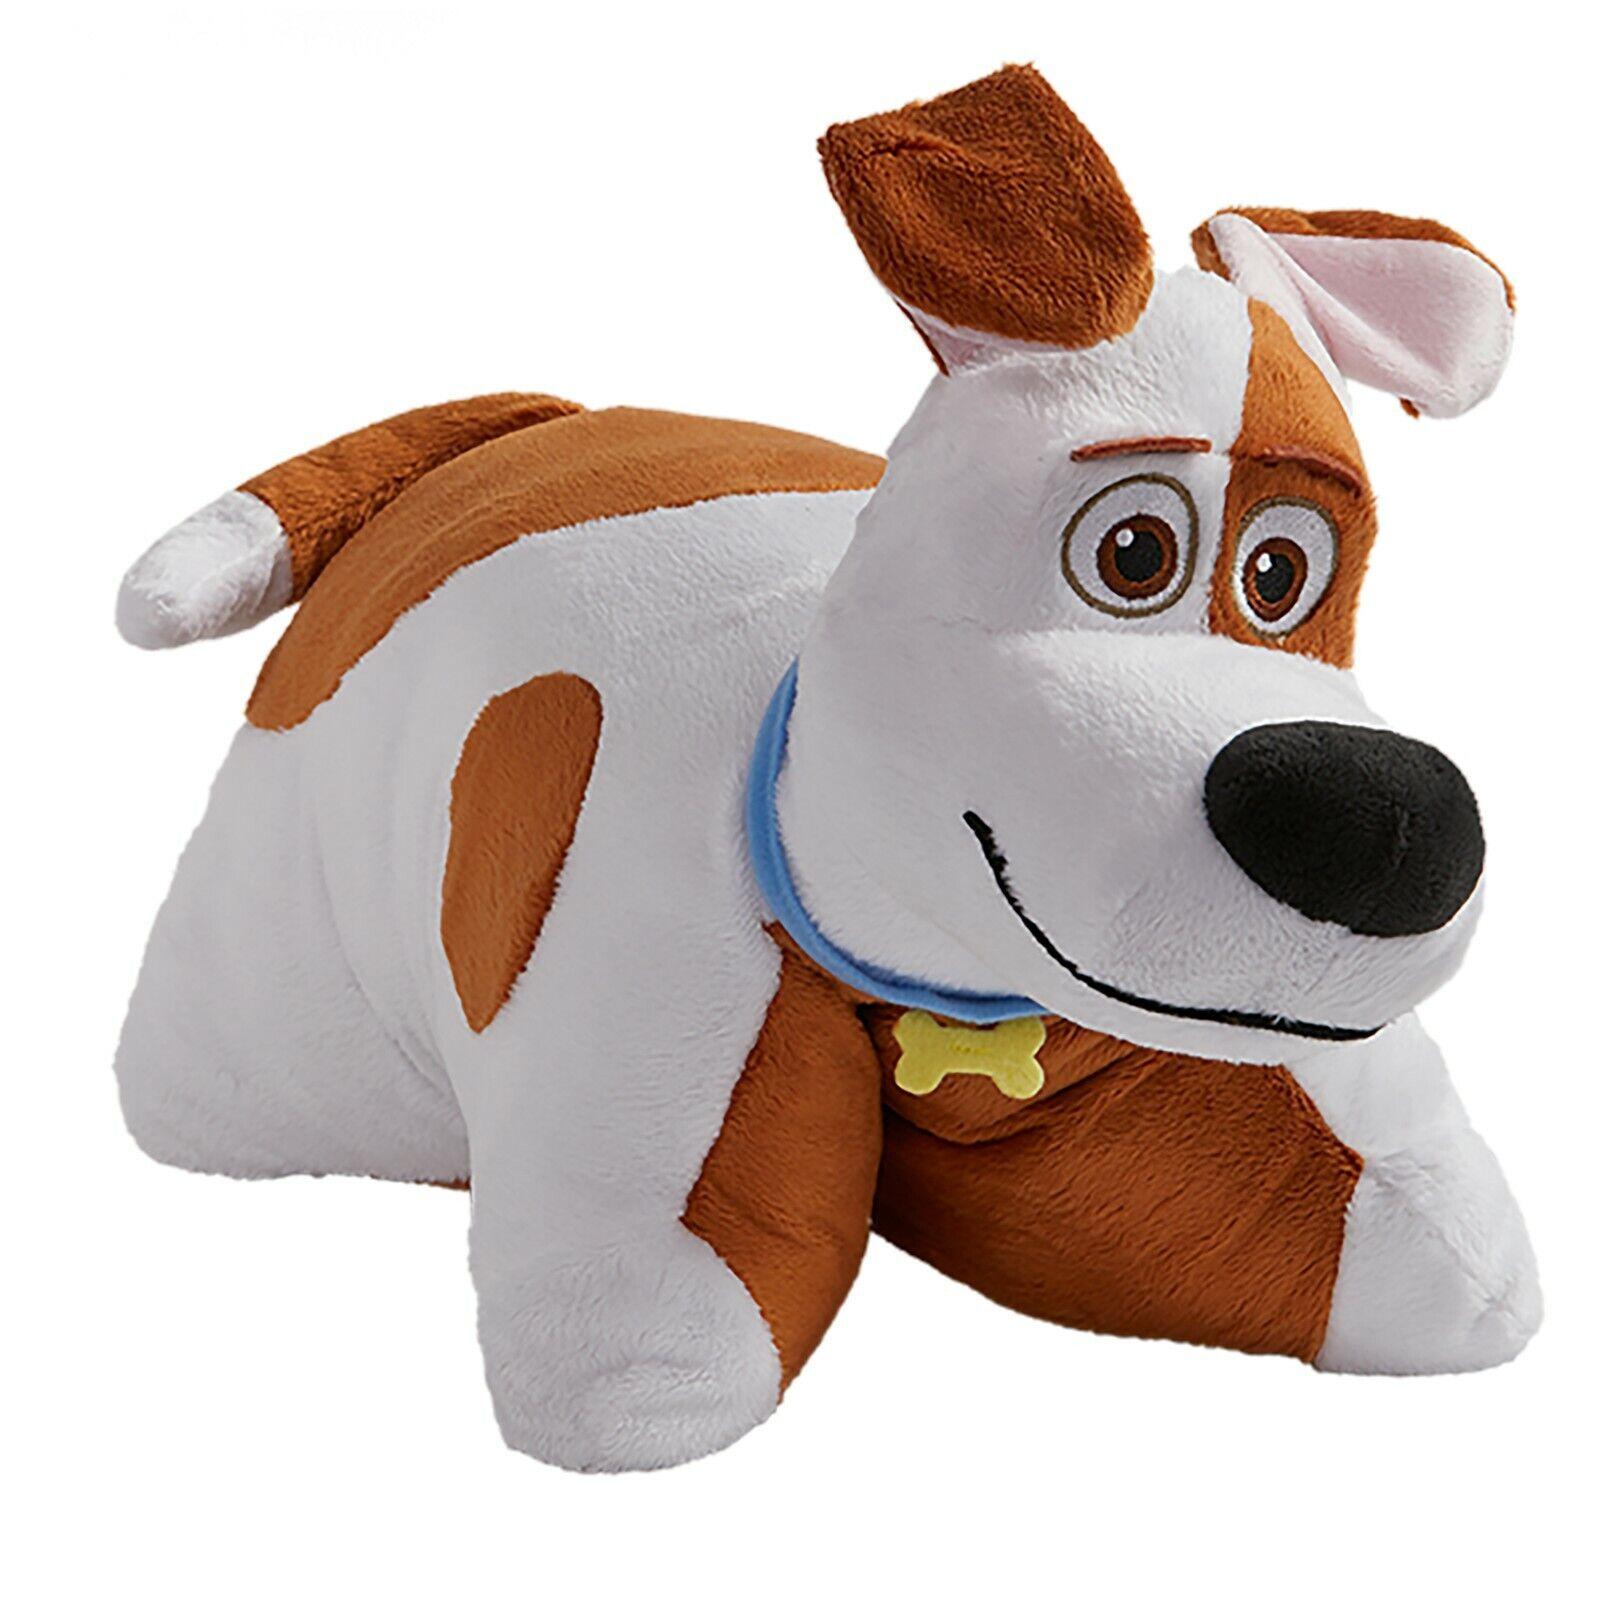 Pillow Pets NBCUniversal Secret Life of Pets 2 Max Stuffed A